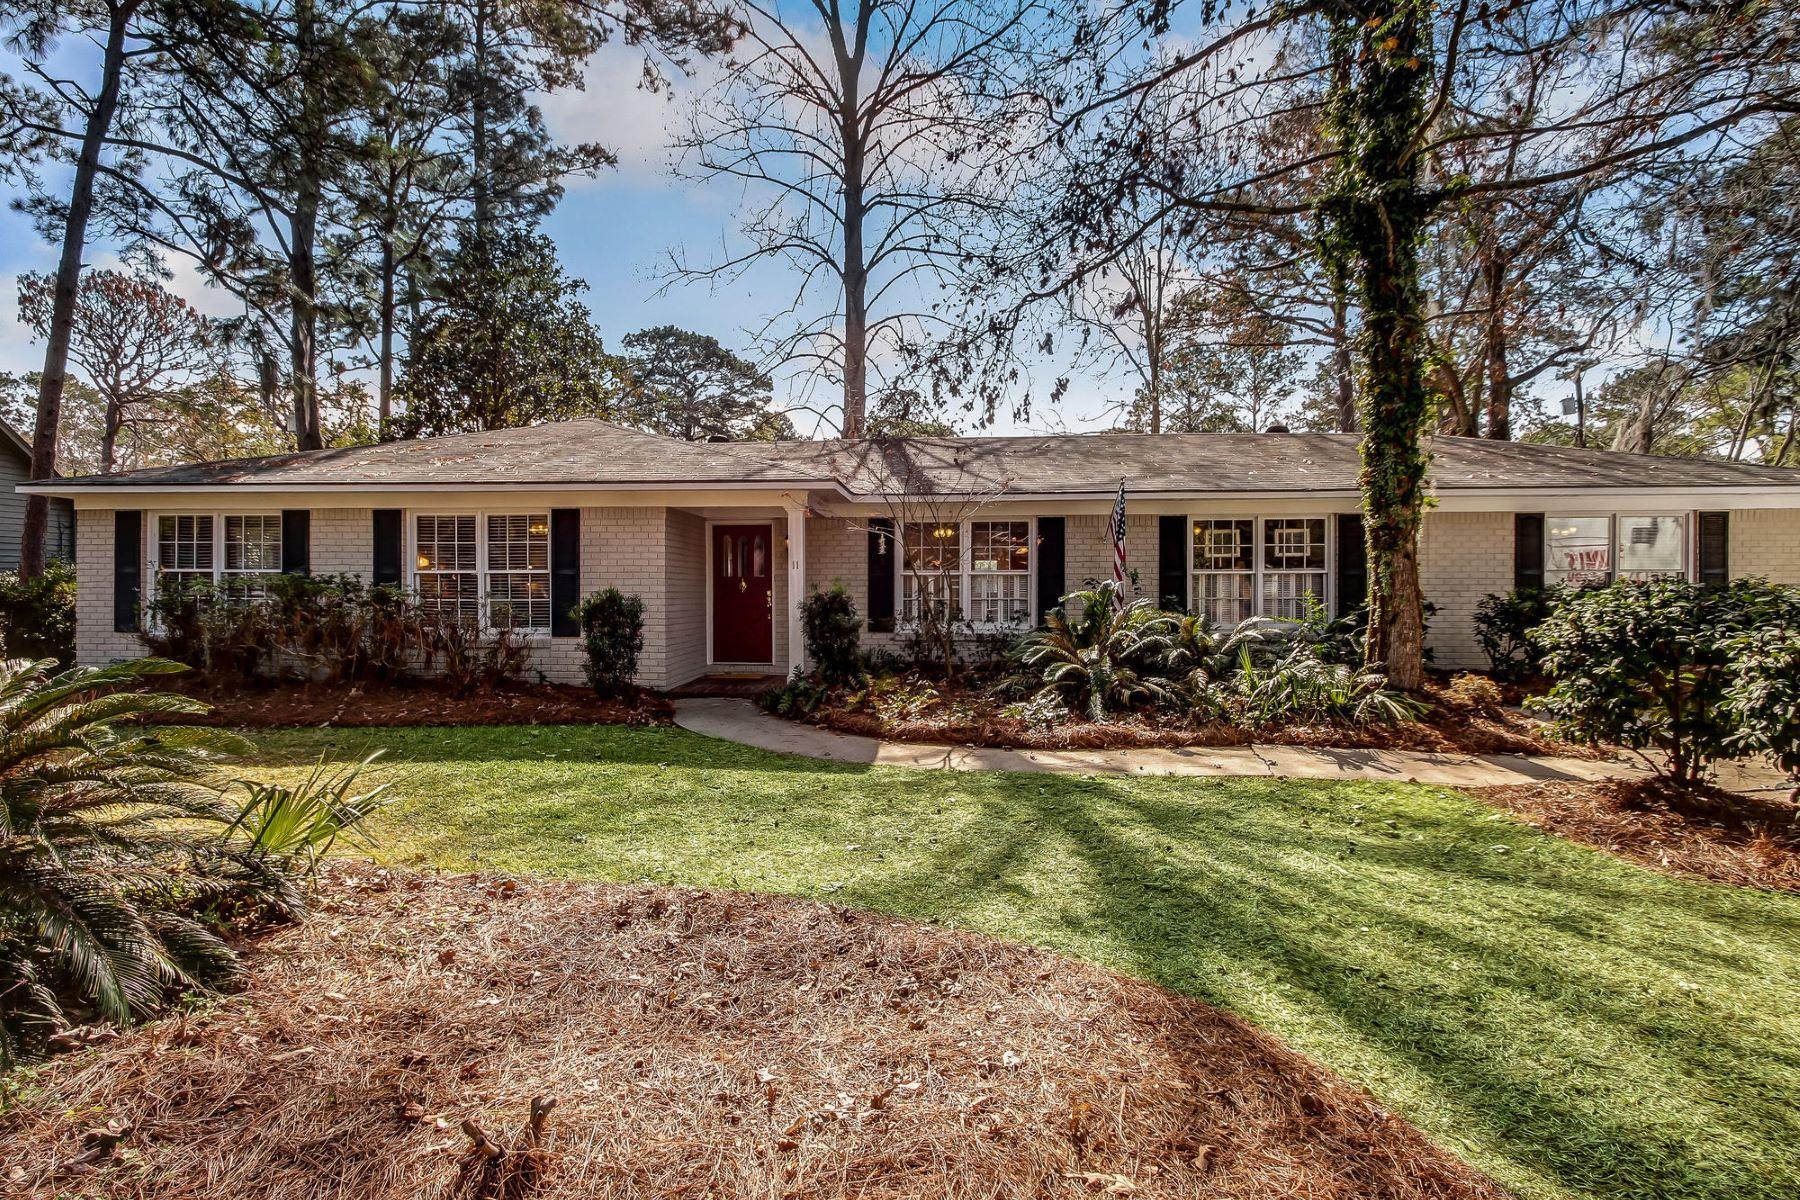 واحد منزل الأسرة للـ Sale في 11 Wylly Avenue Isle of Hope, Savannah, Georgia, 31406 United States